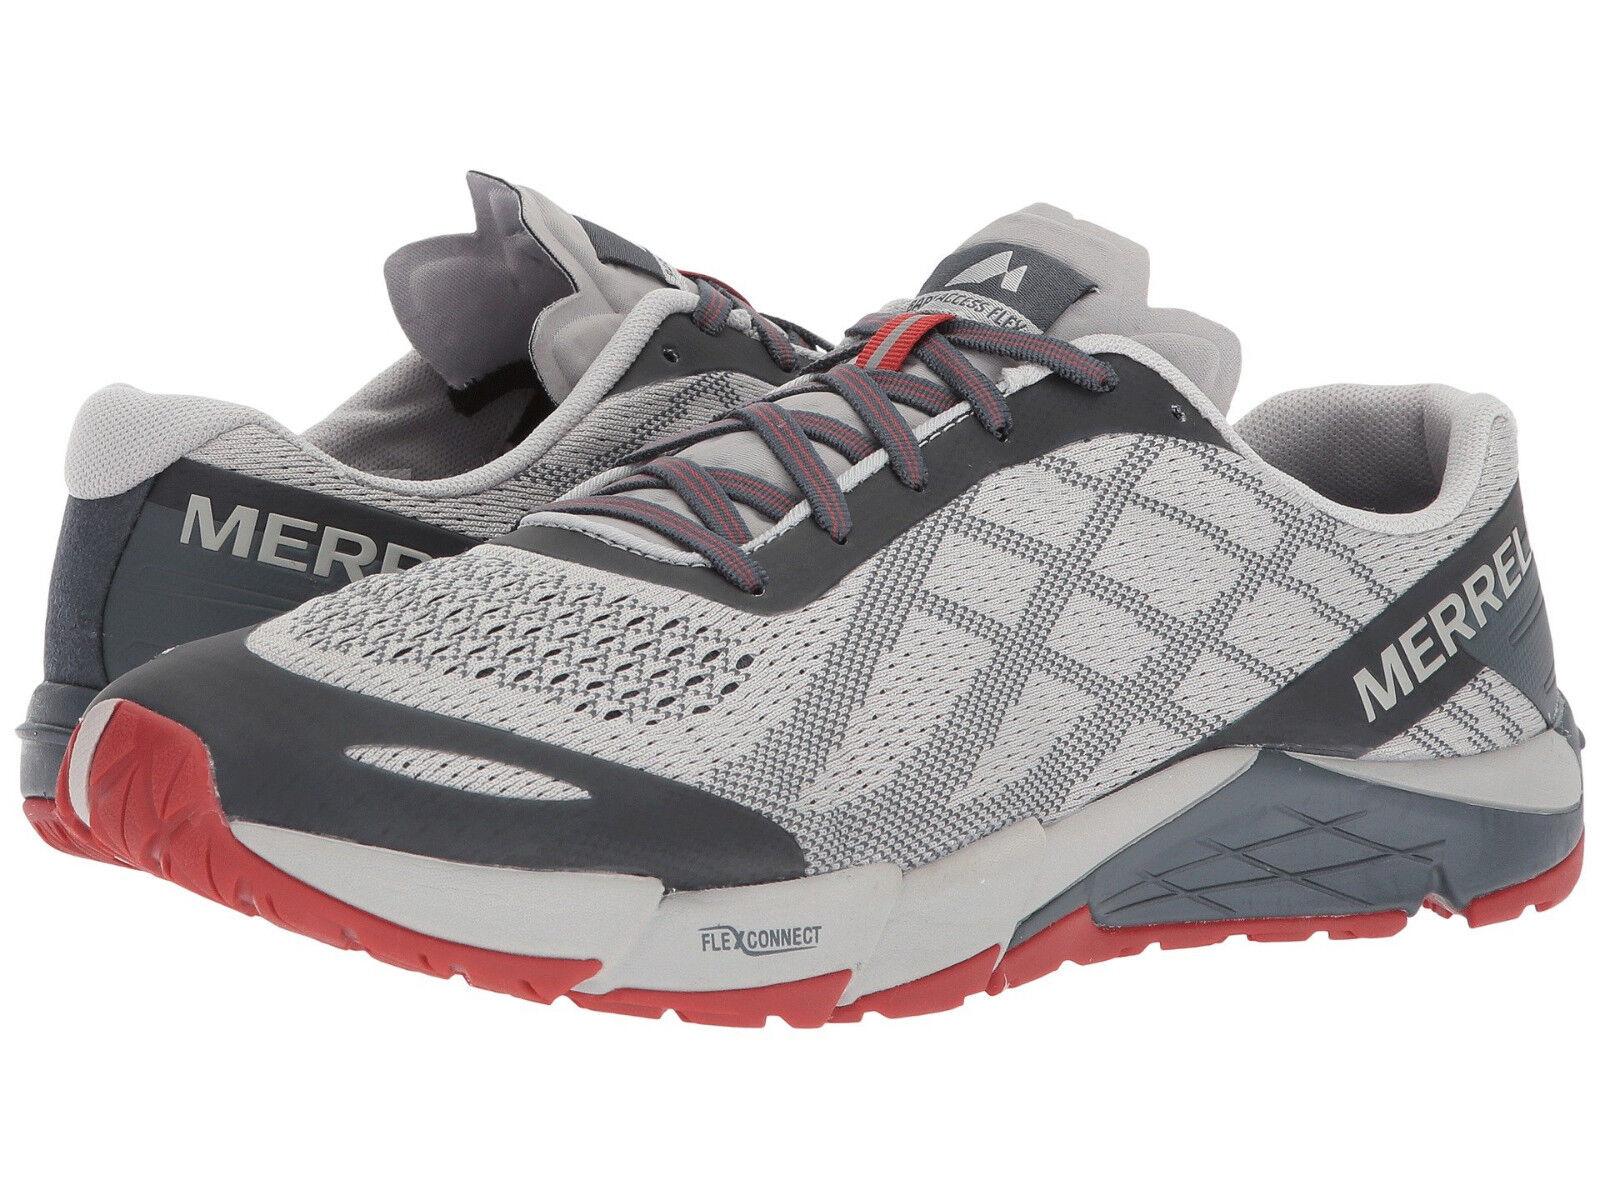 Merrell Uomo Bare Access Flex E-Mesh Low Trainers Shoes Trail Fashion Kicks